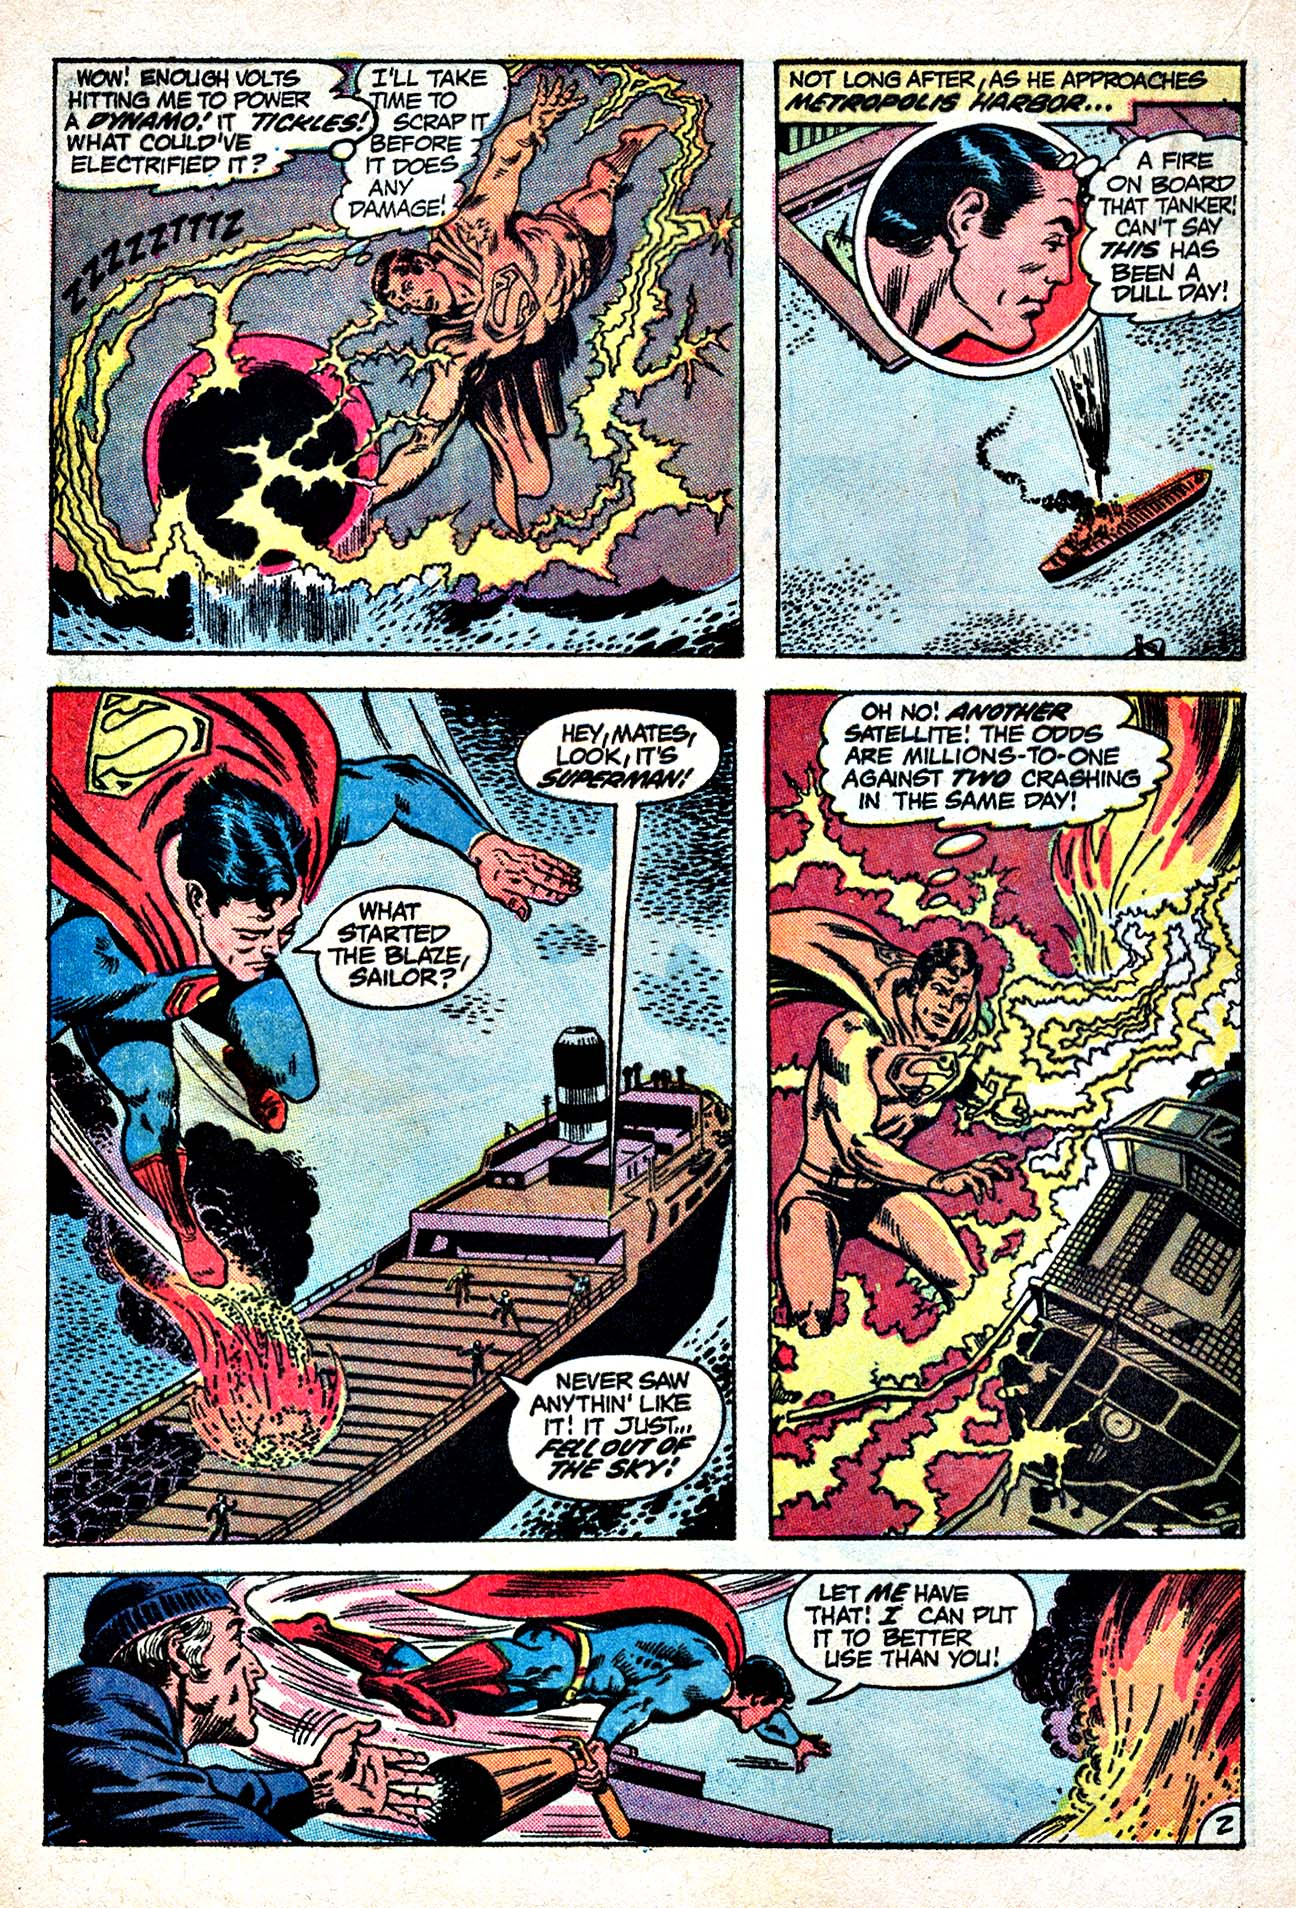 Action Comics (1938) 412 Page 22